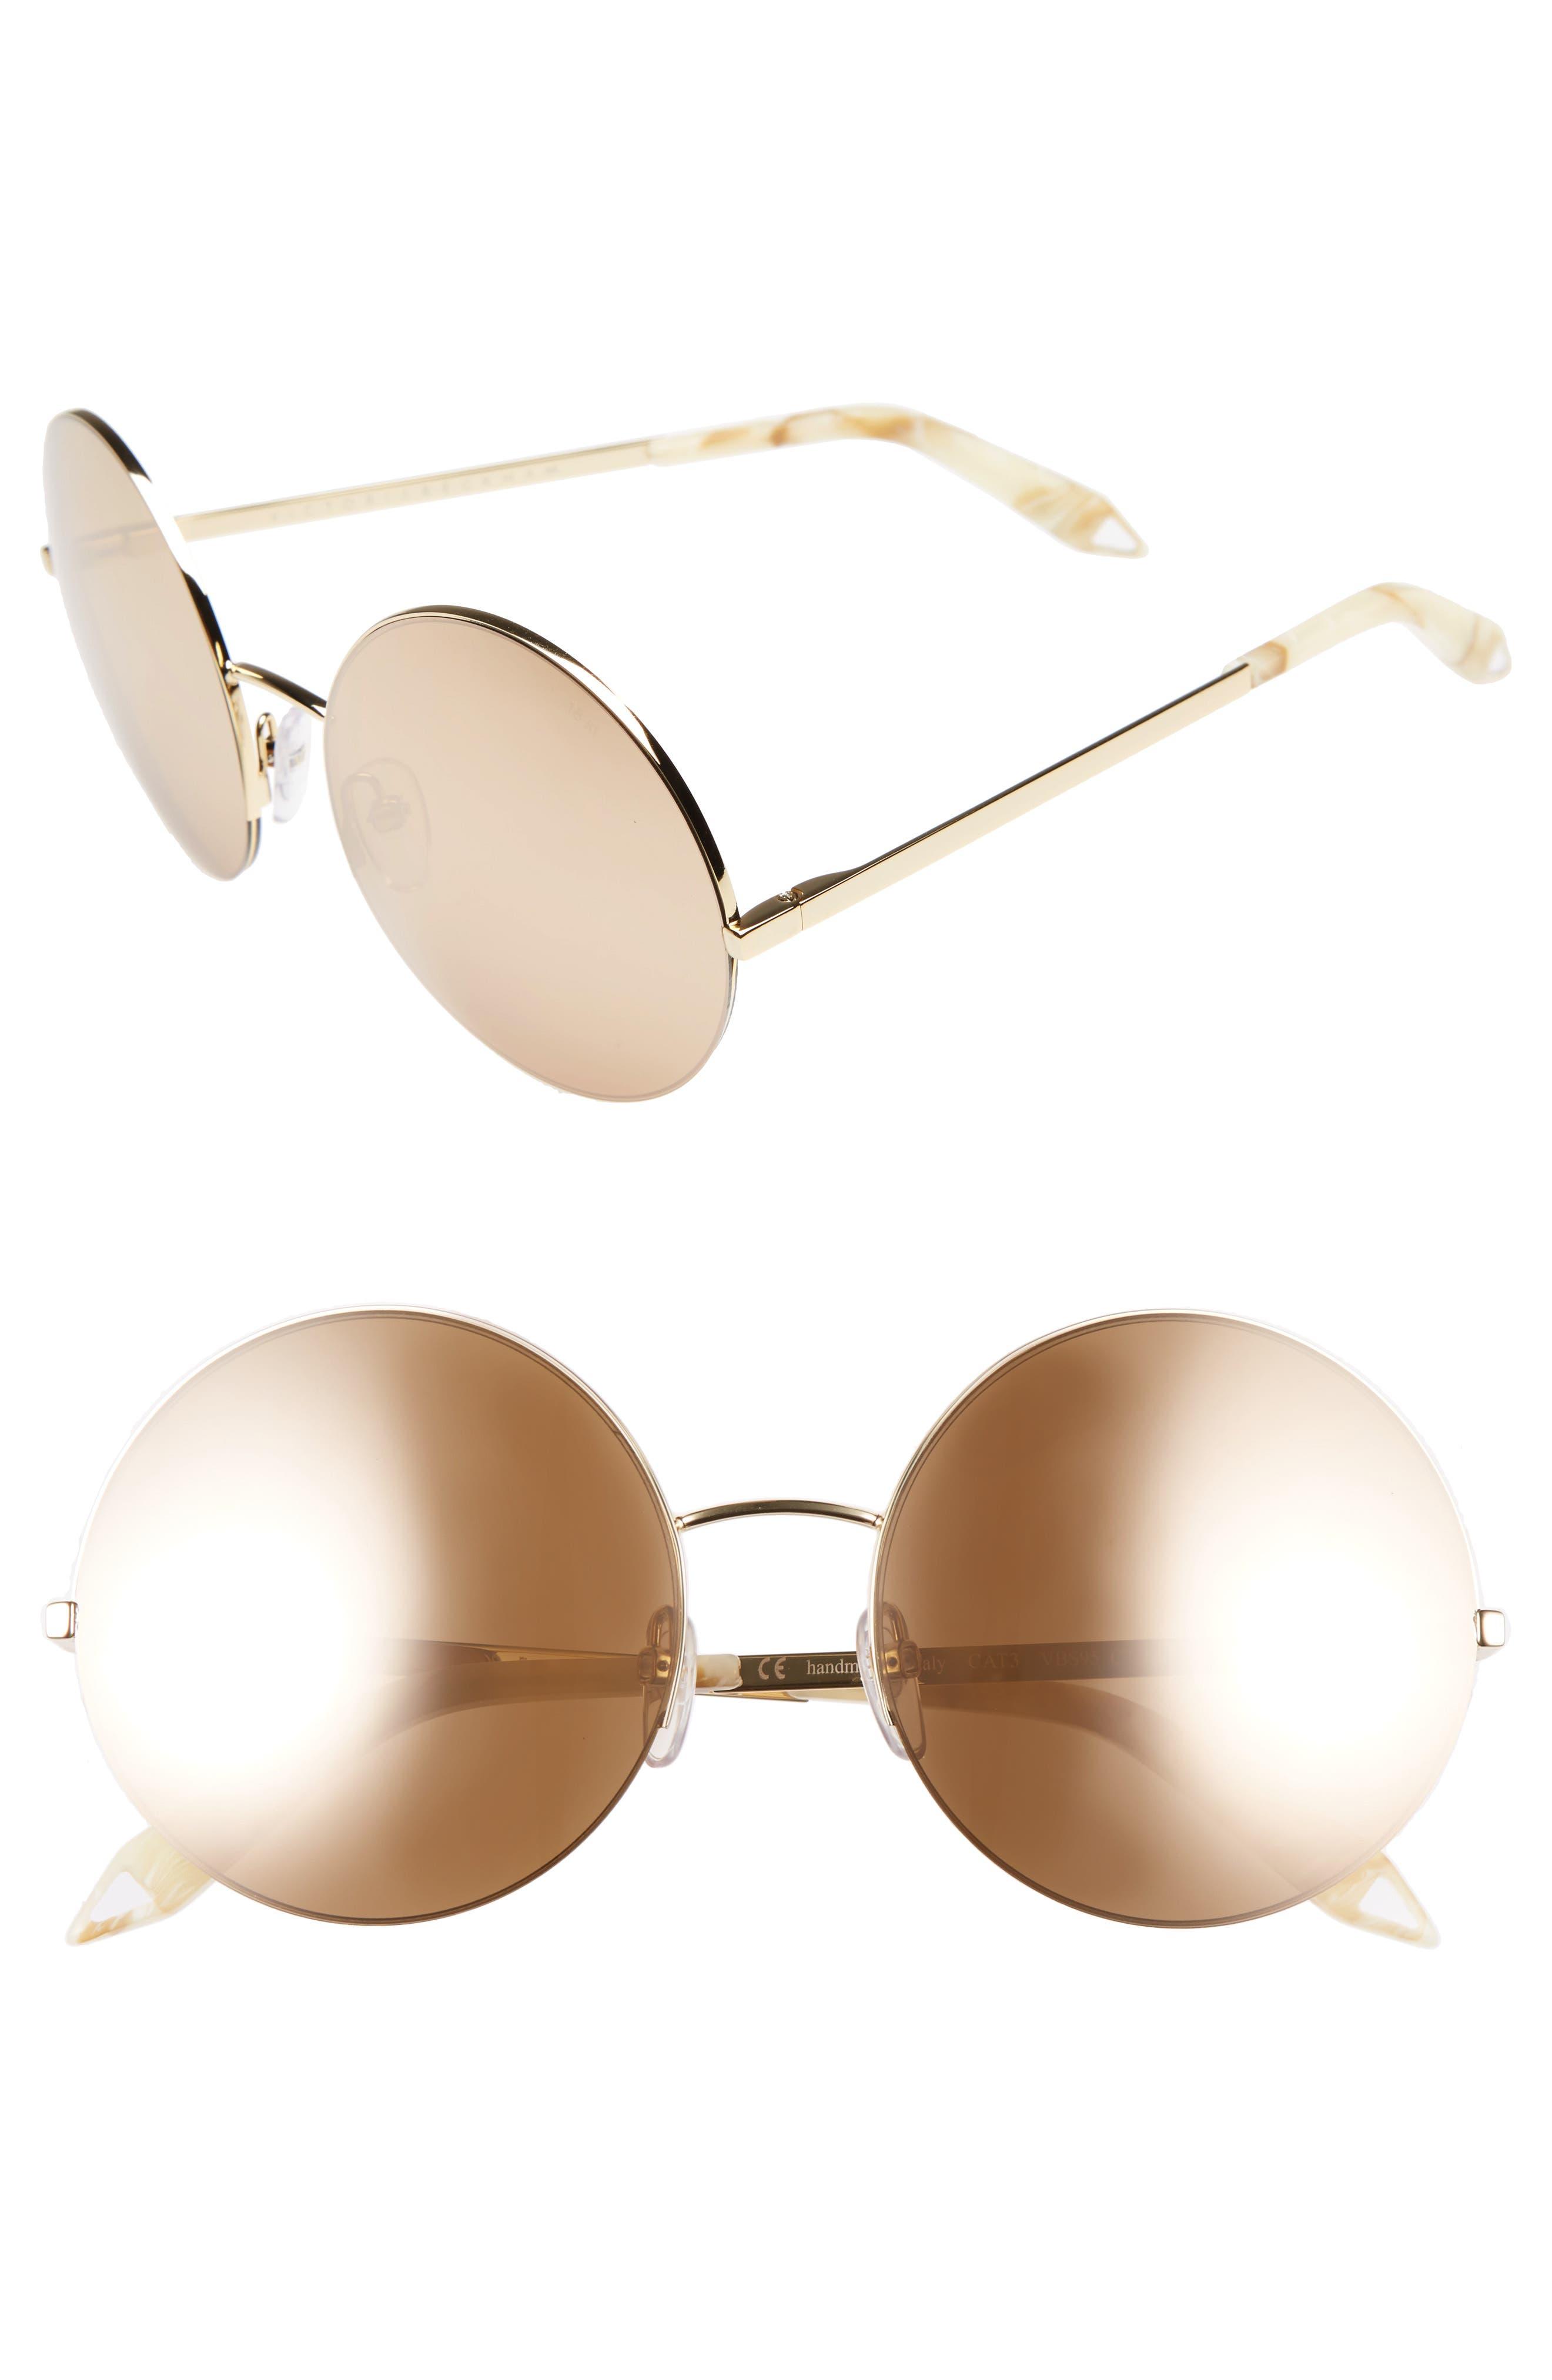 VICTORIA BECKHAM 56mm Round Sunglasses, Main, color, GOLD METALLIC/ GOLD MIRROR